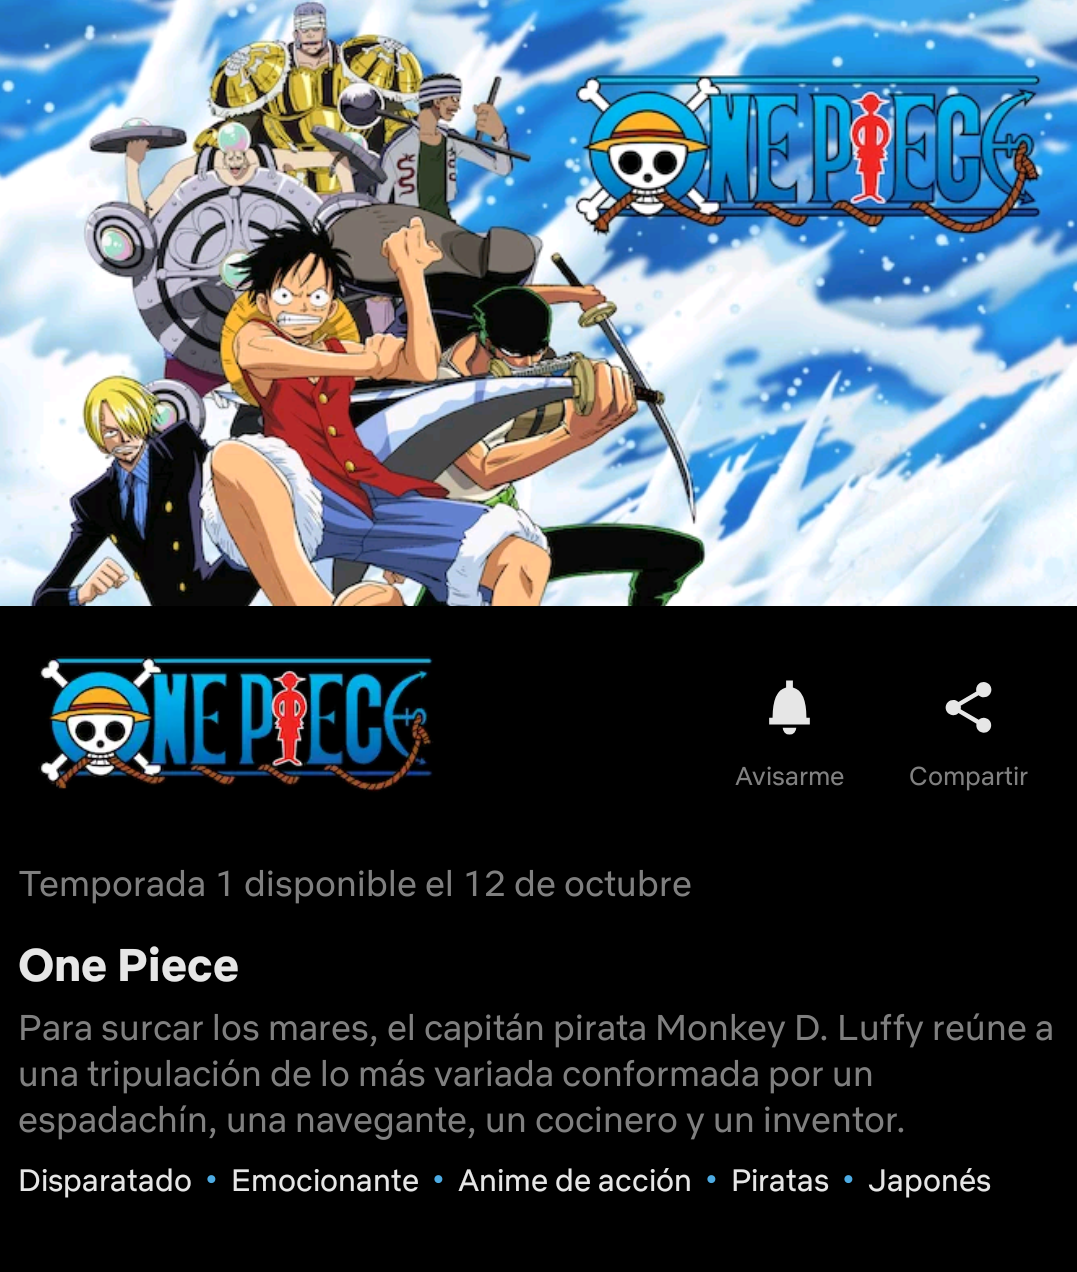 One Piece llegará a Netflix en octubre - ANMTV